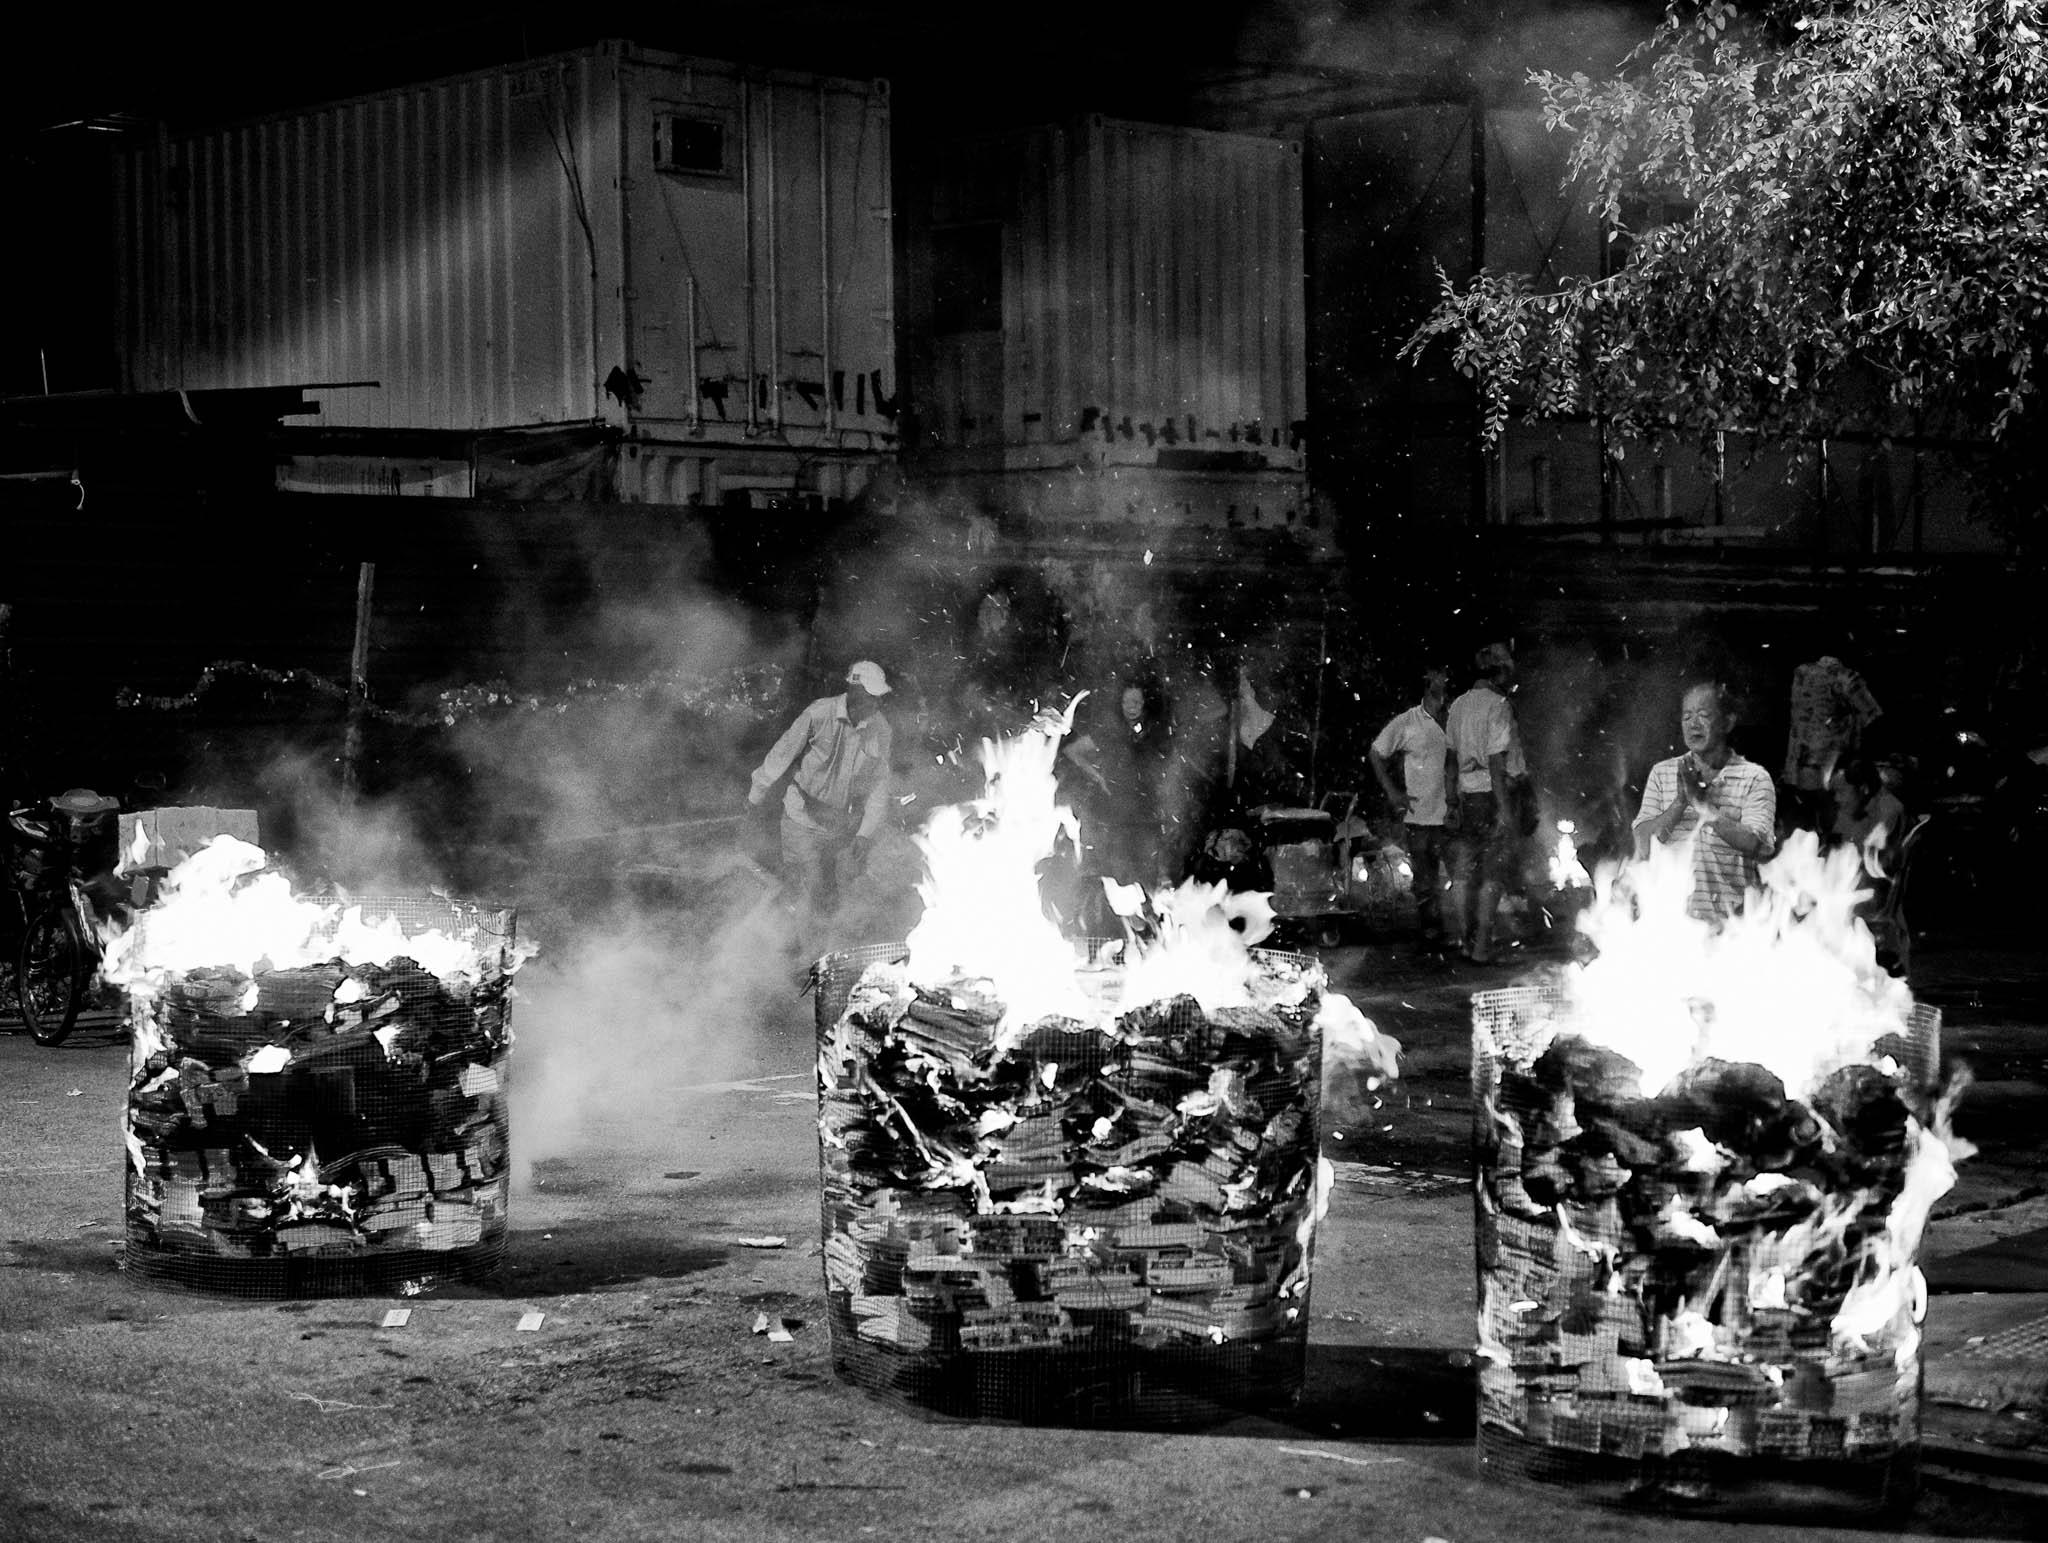 Street vendors offering 7th month prayers after burning up bundles of joss paper, Jln Besar, Singapore